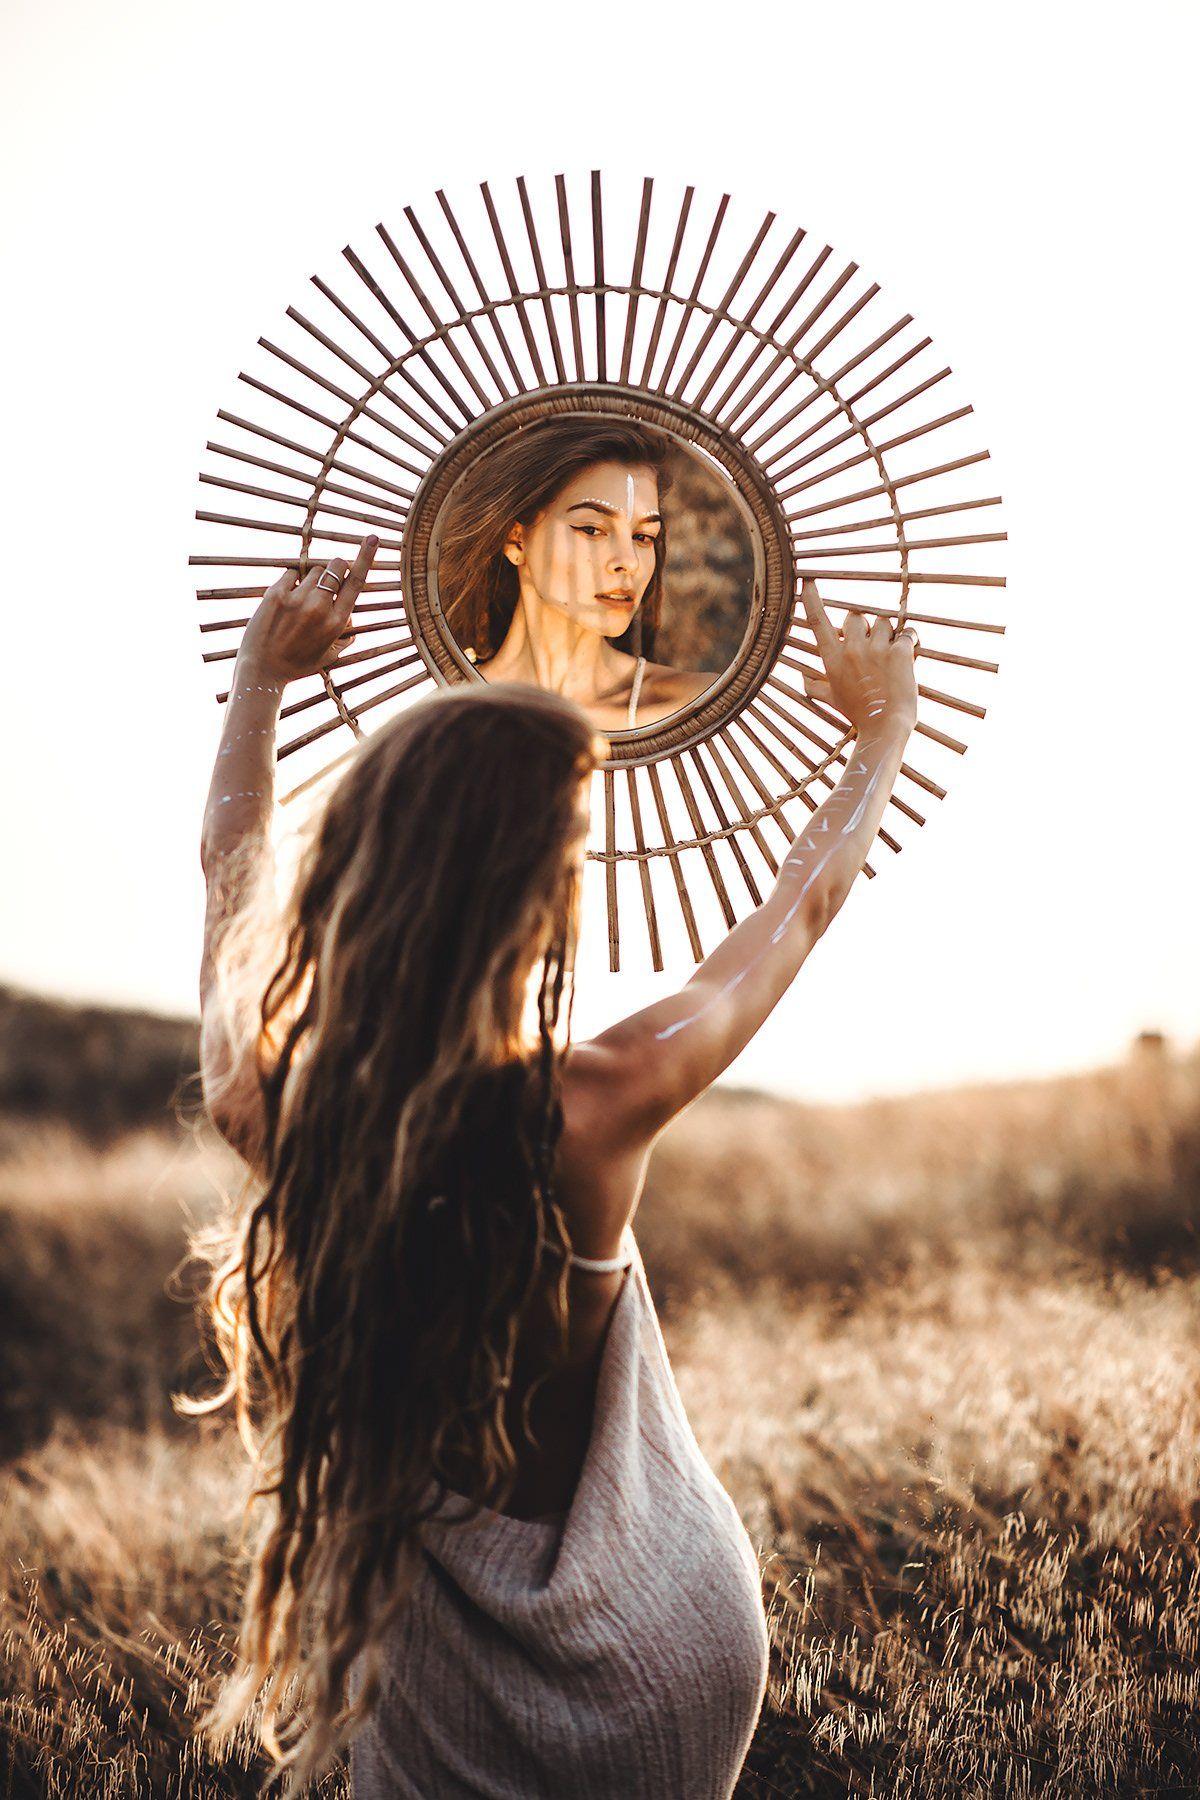 sun, mirror, dreadlocks, dreads, sunlight, sunset, field, yellow, Молочкова Ася